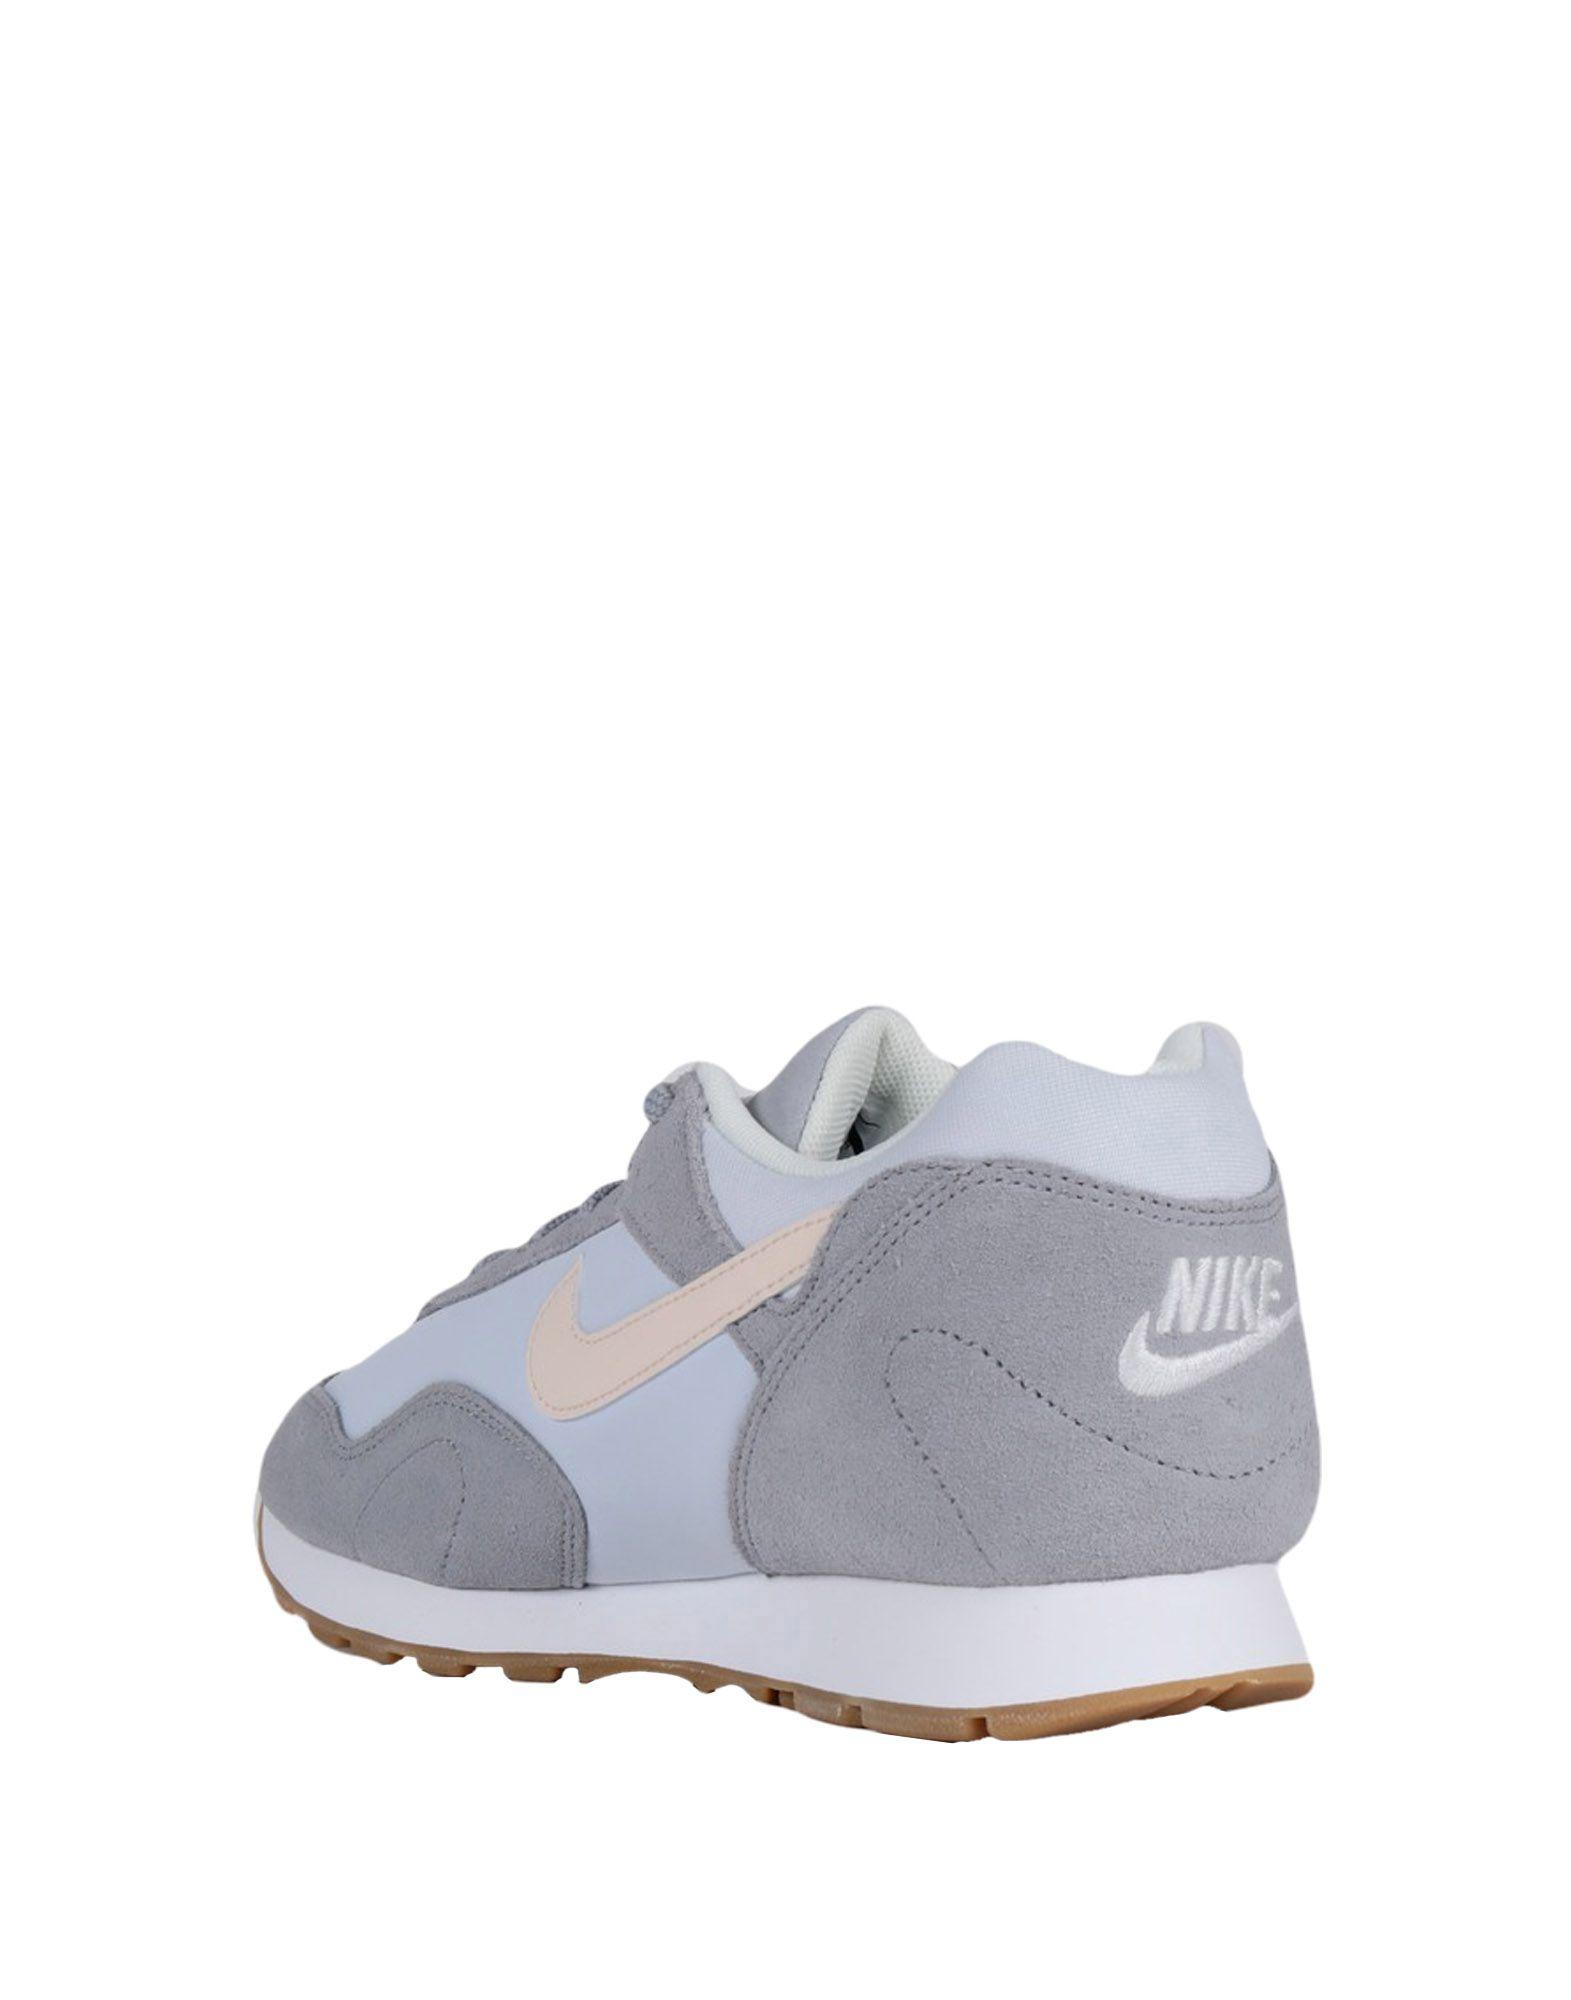 Nike 11543401SJ   Outburst  11543401SJ Nike Gute Qualität beliebte Schuhe d75947